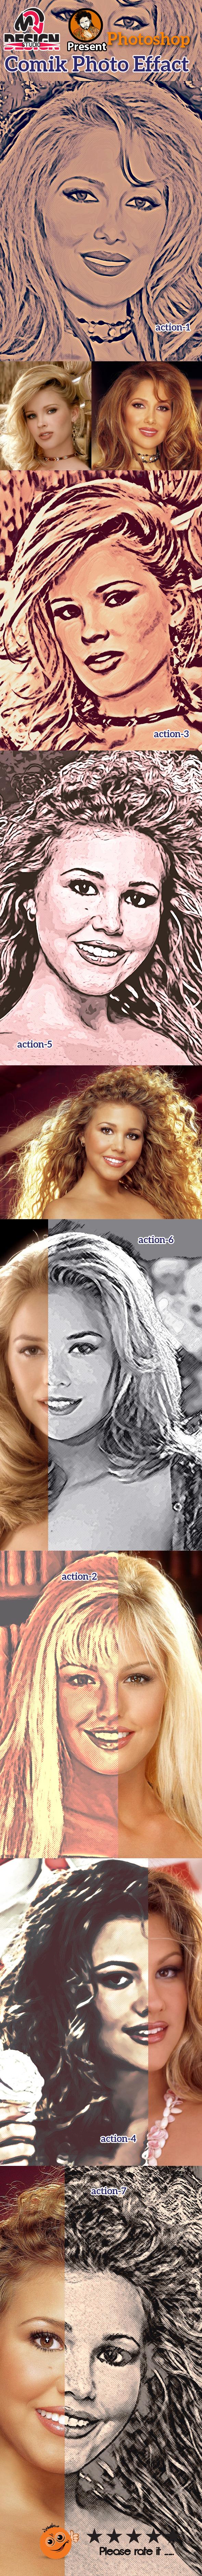 Comik Photo Effect - Actions Photoshop